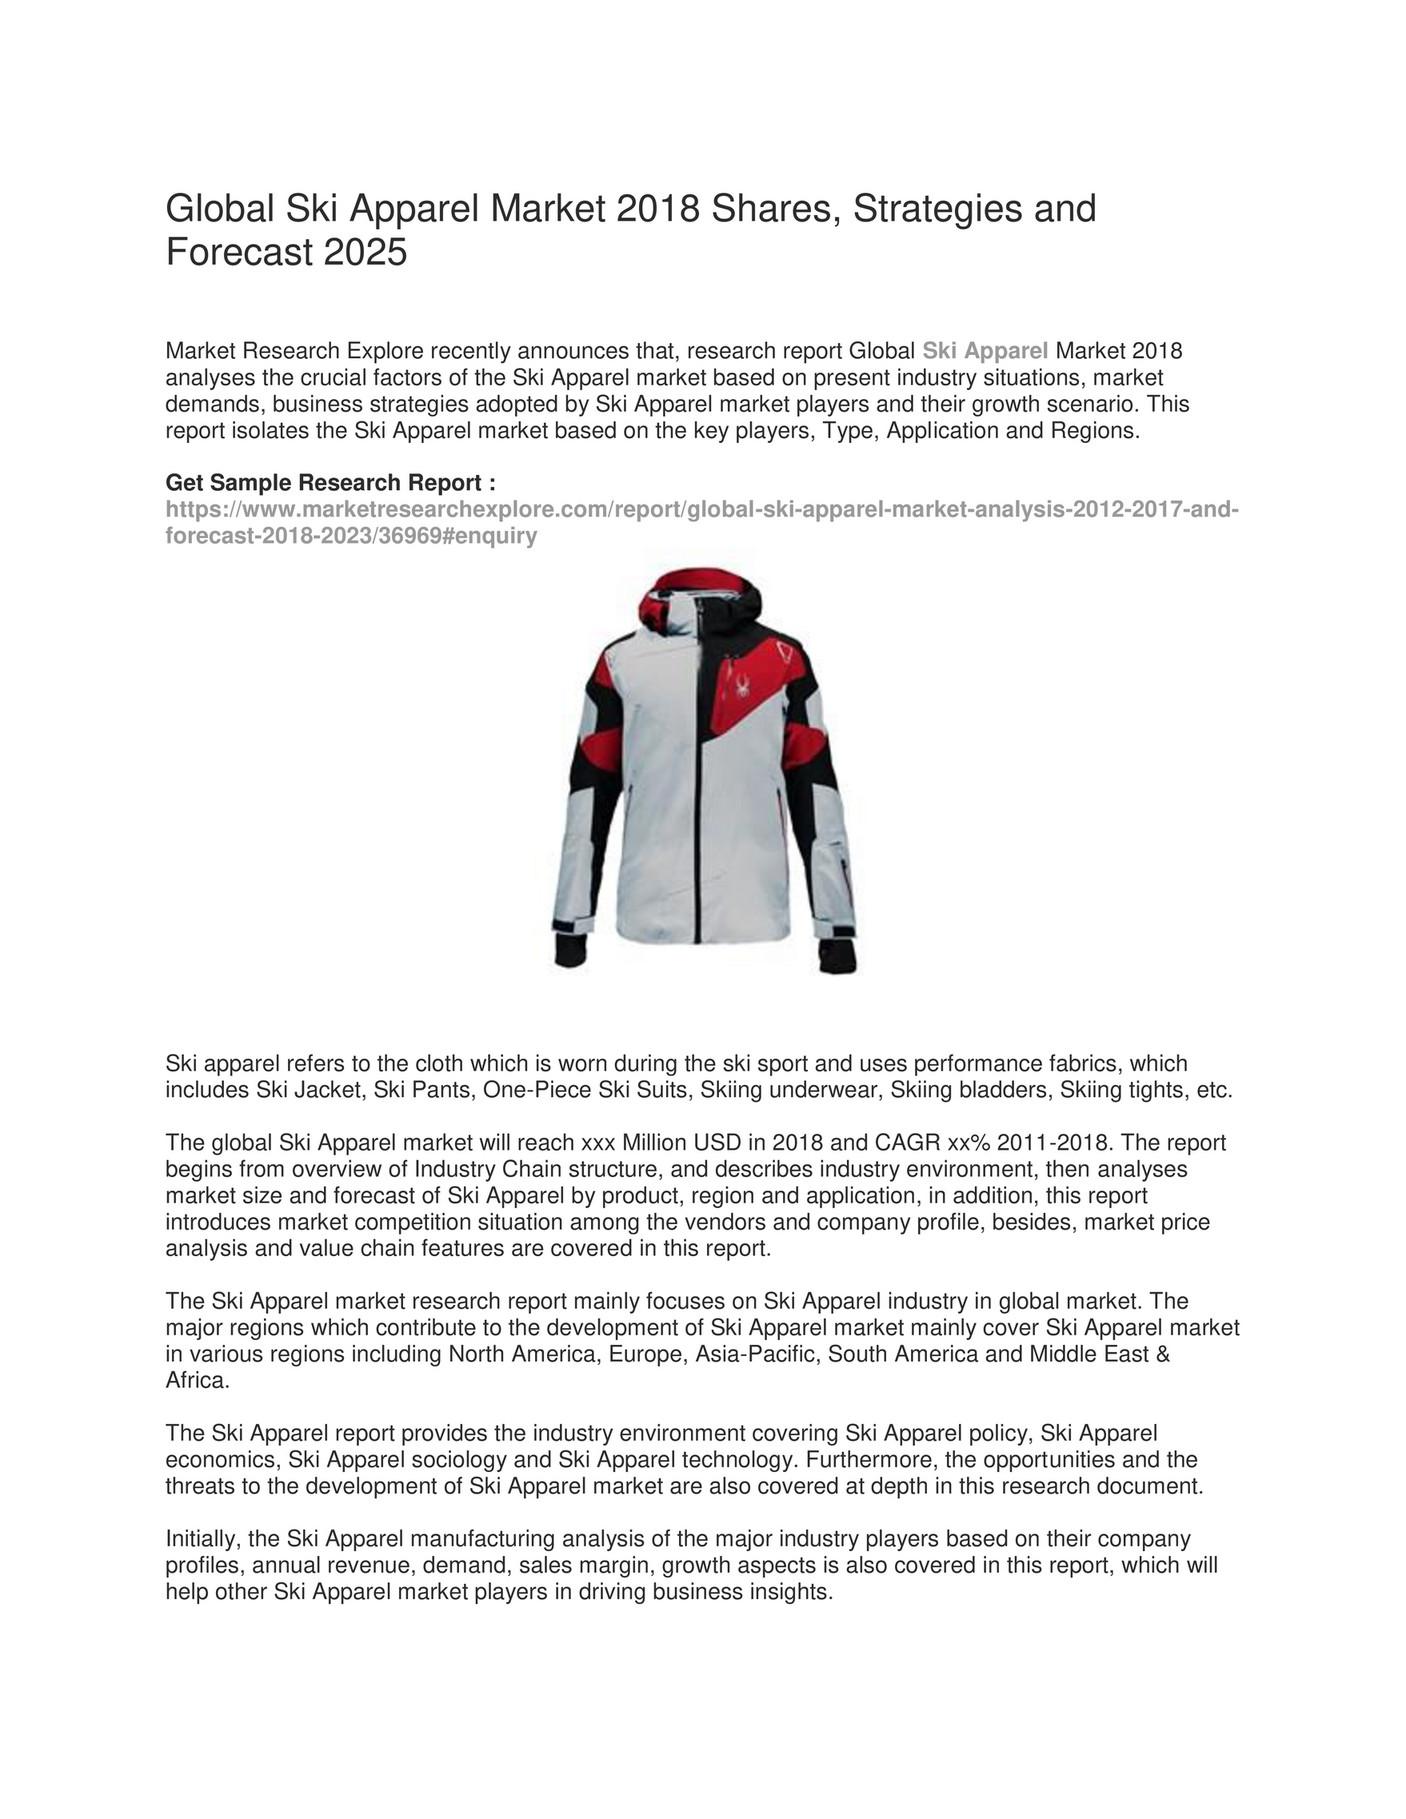 My publications - Global Ski Apparel Market - Page 1